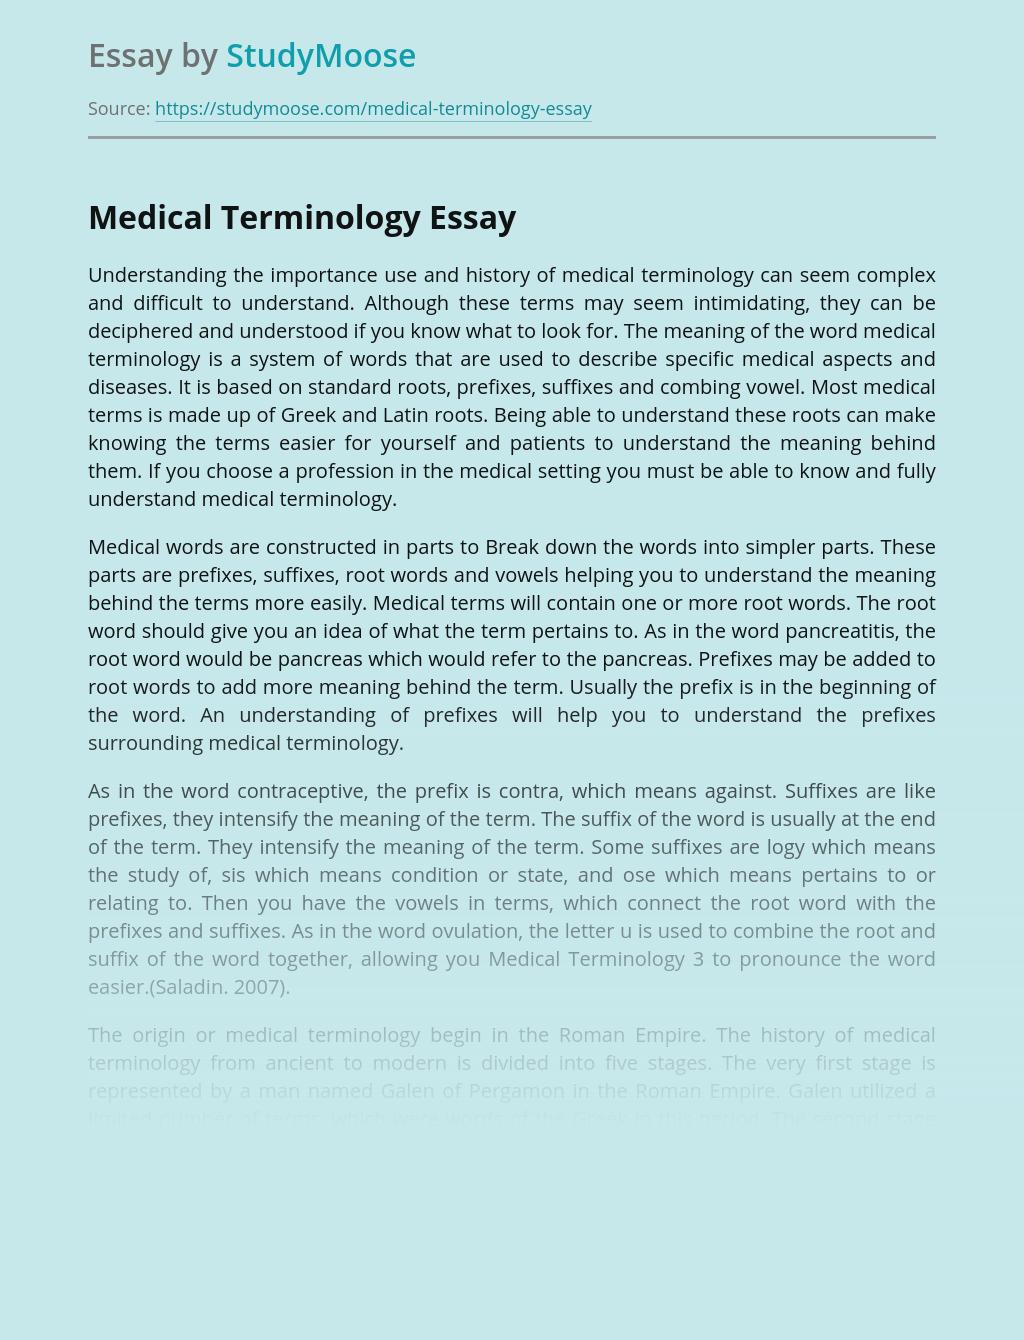 Terminology of Modern Medicine